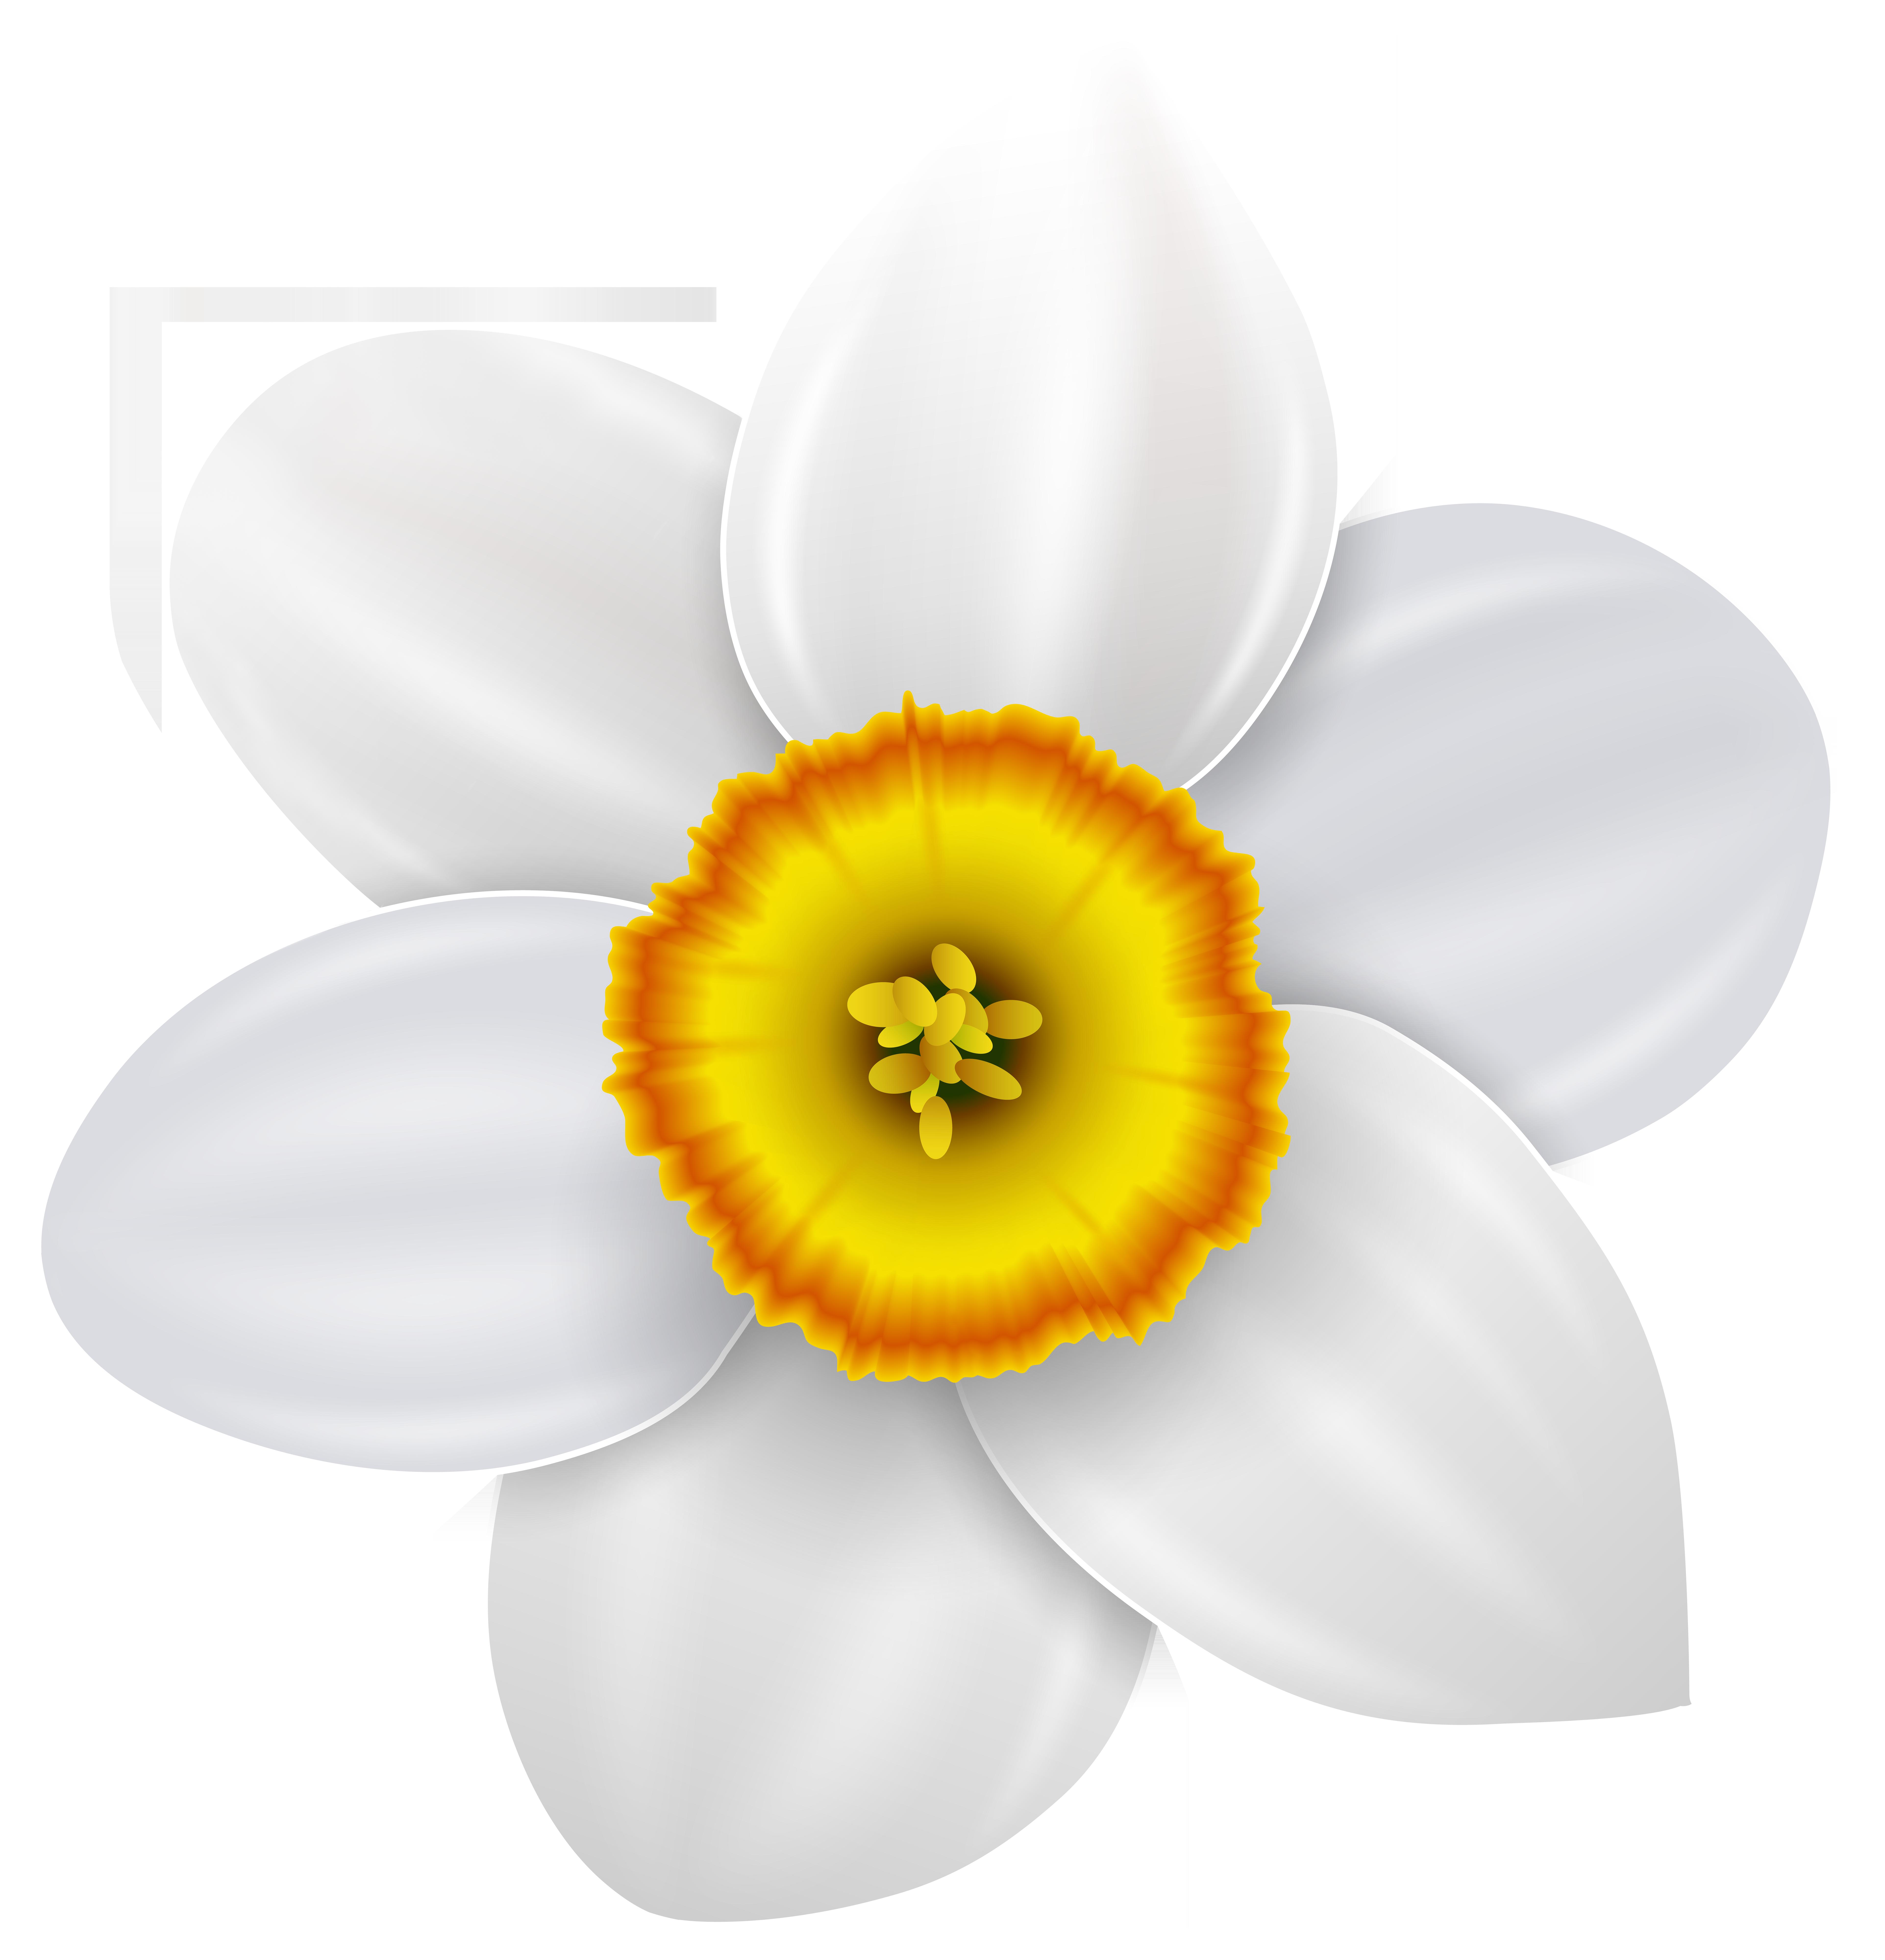 Narcissus Transparent PNG Clip Art Image.